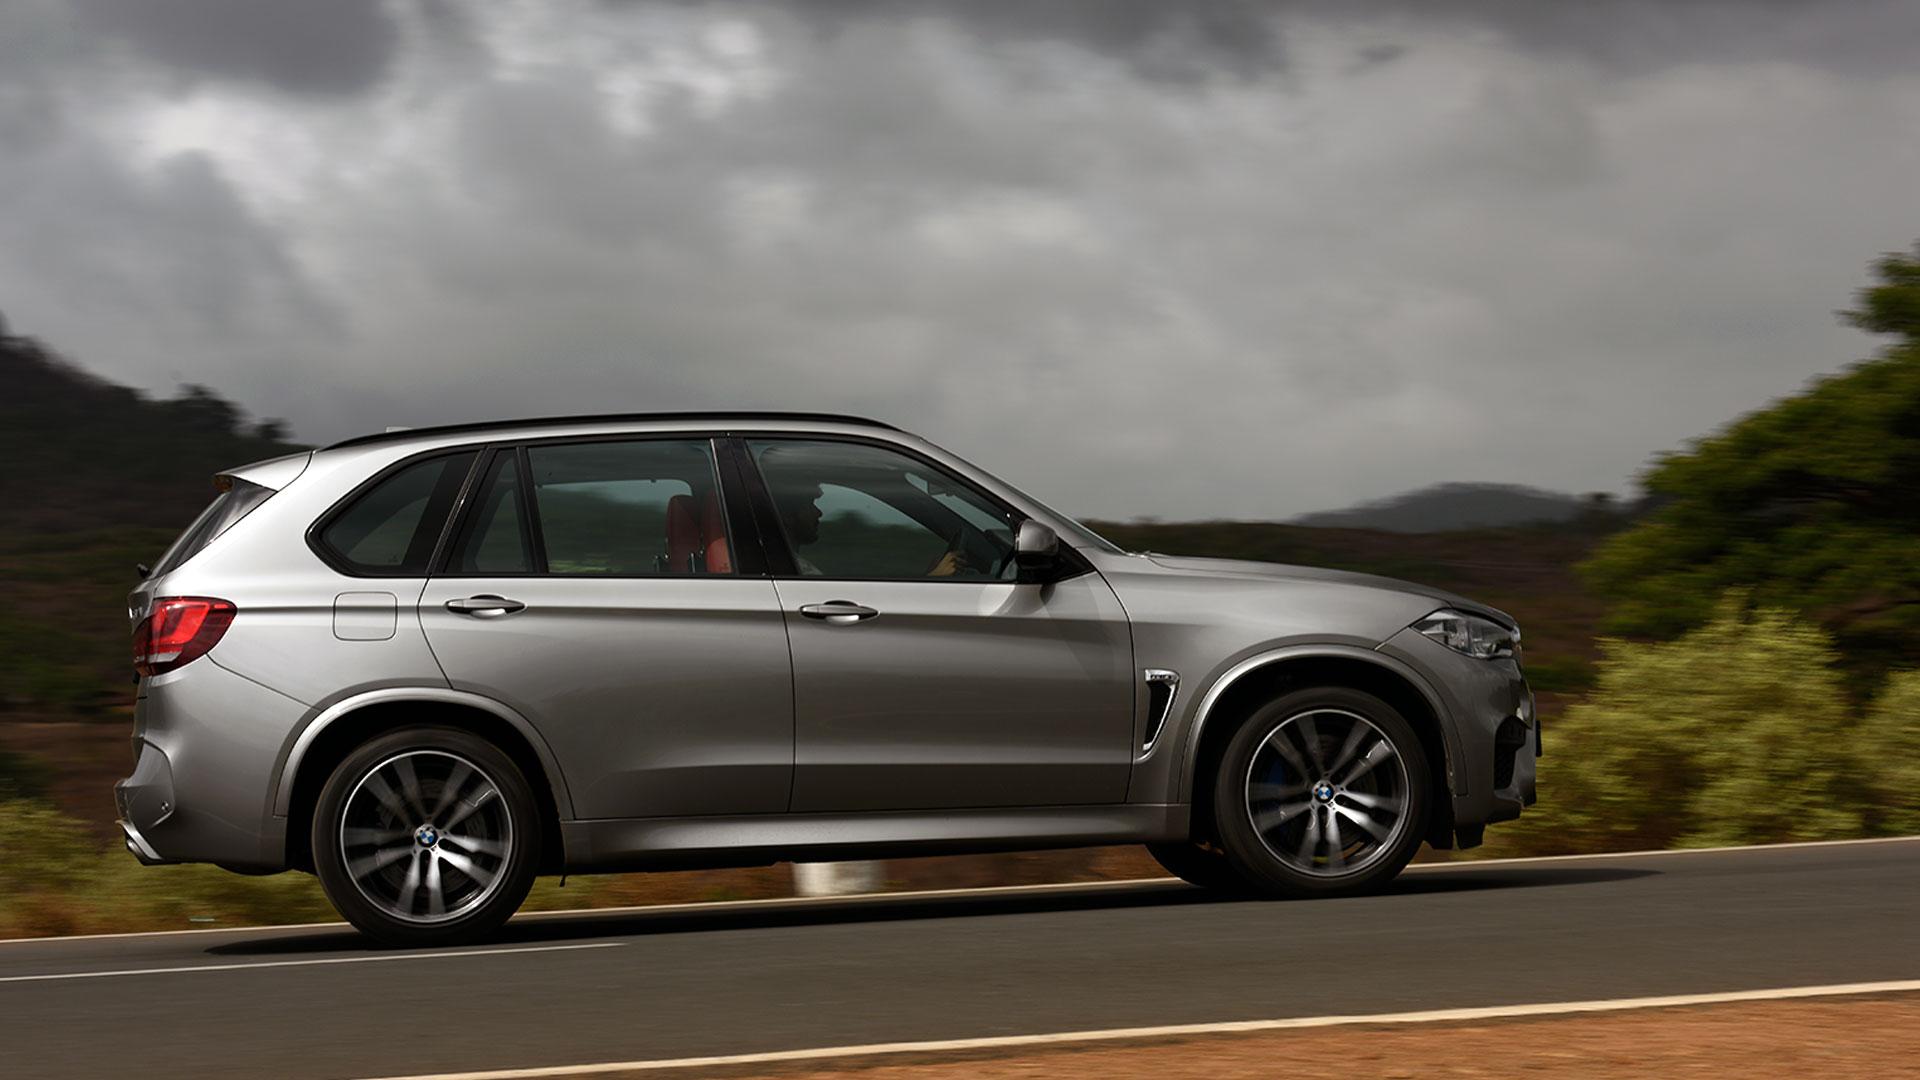 BMW X5 2015 M Exterior